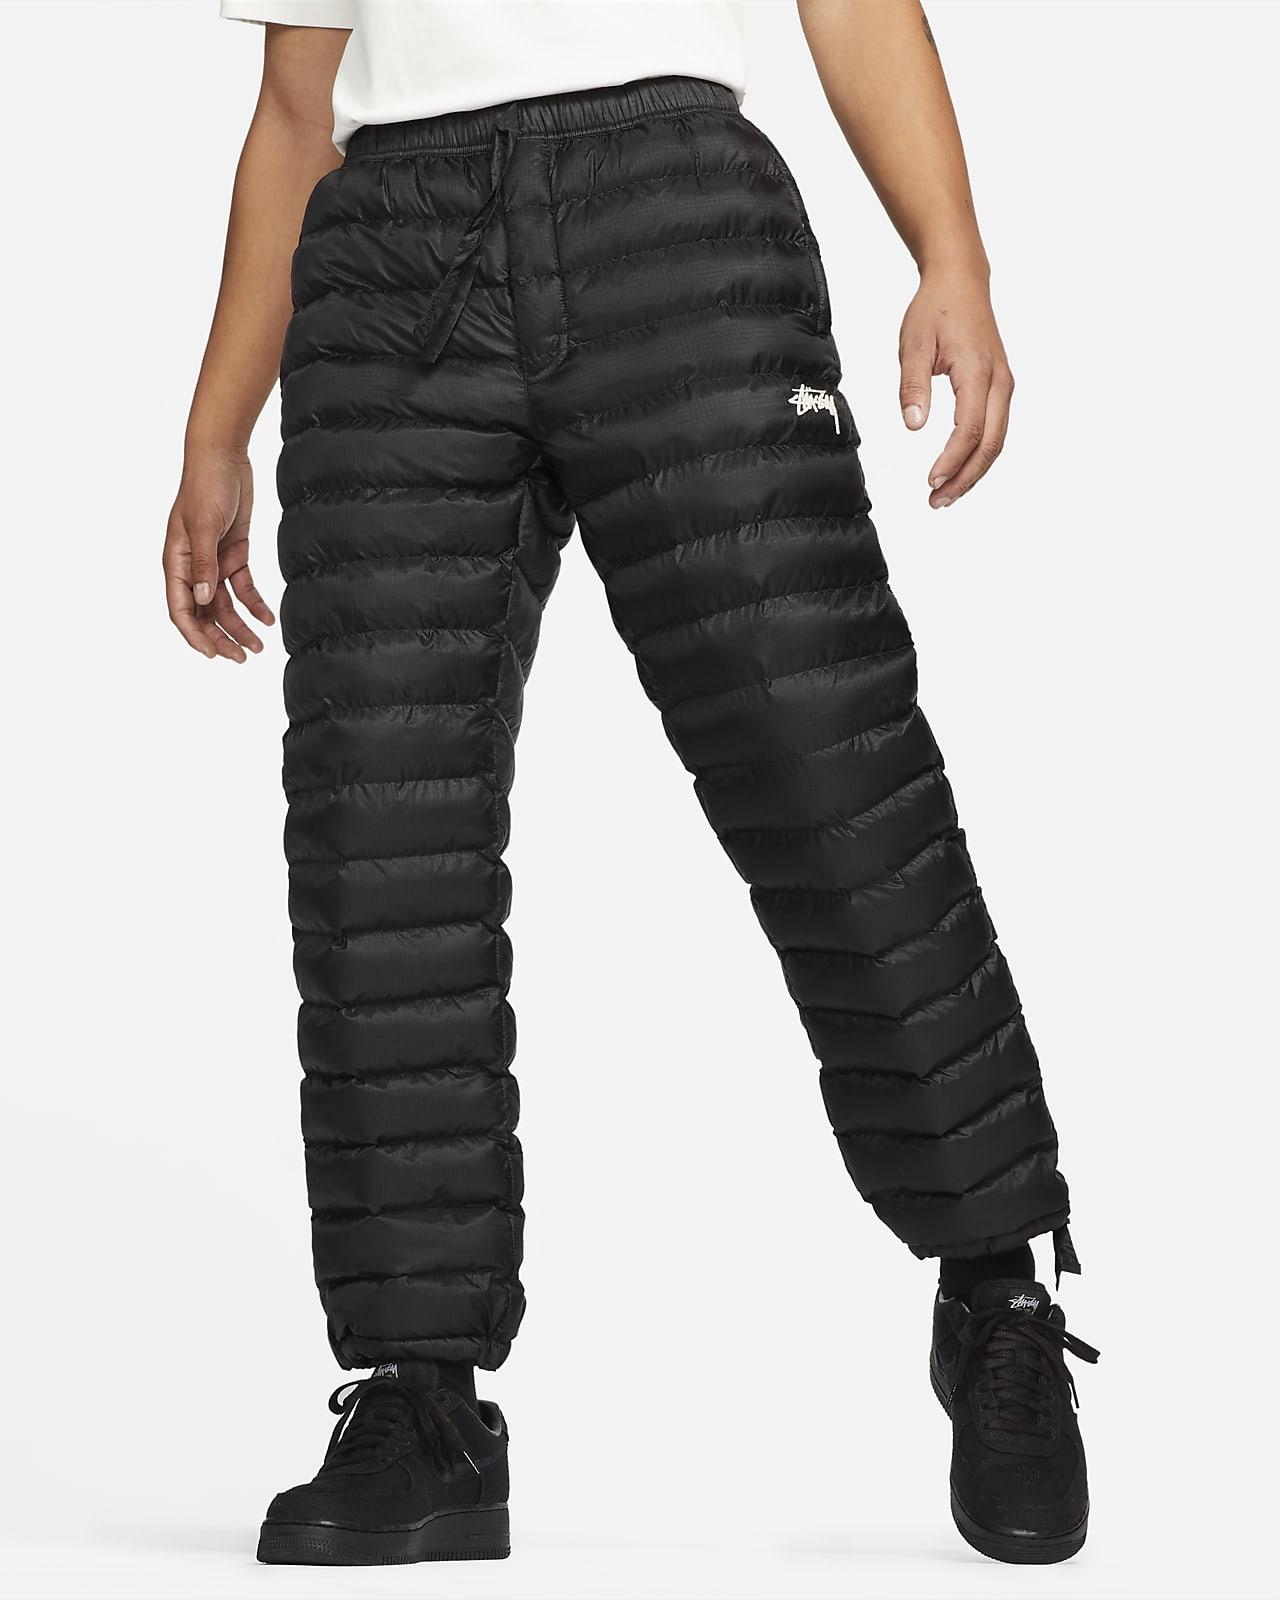 Nike x Stüssy Insulated Pants